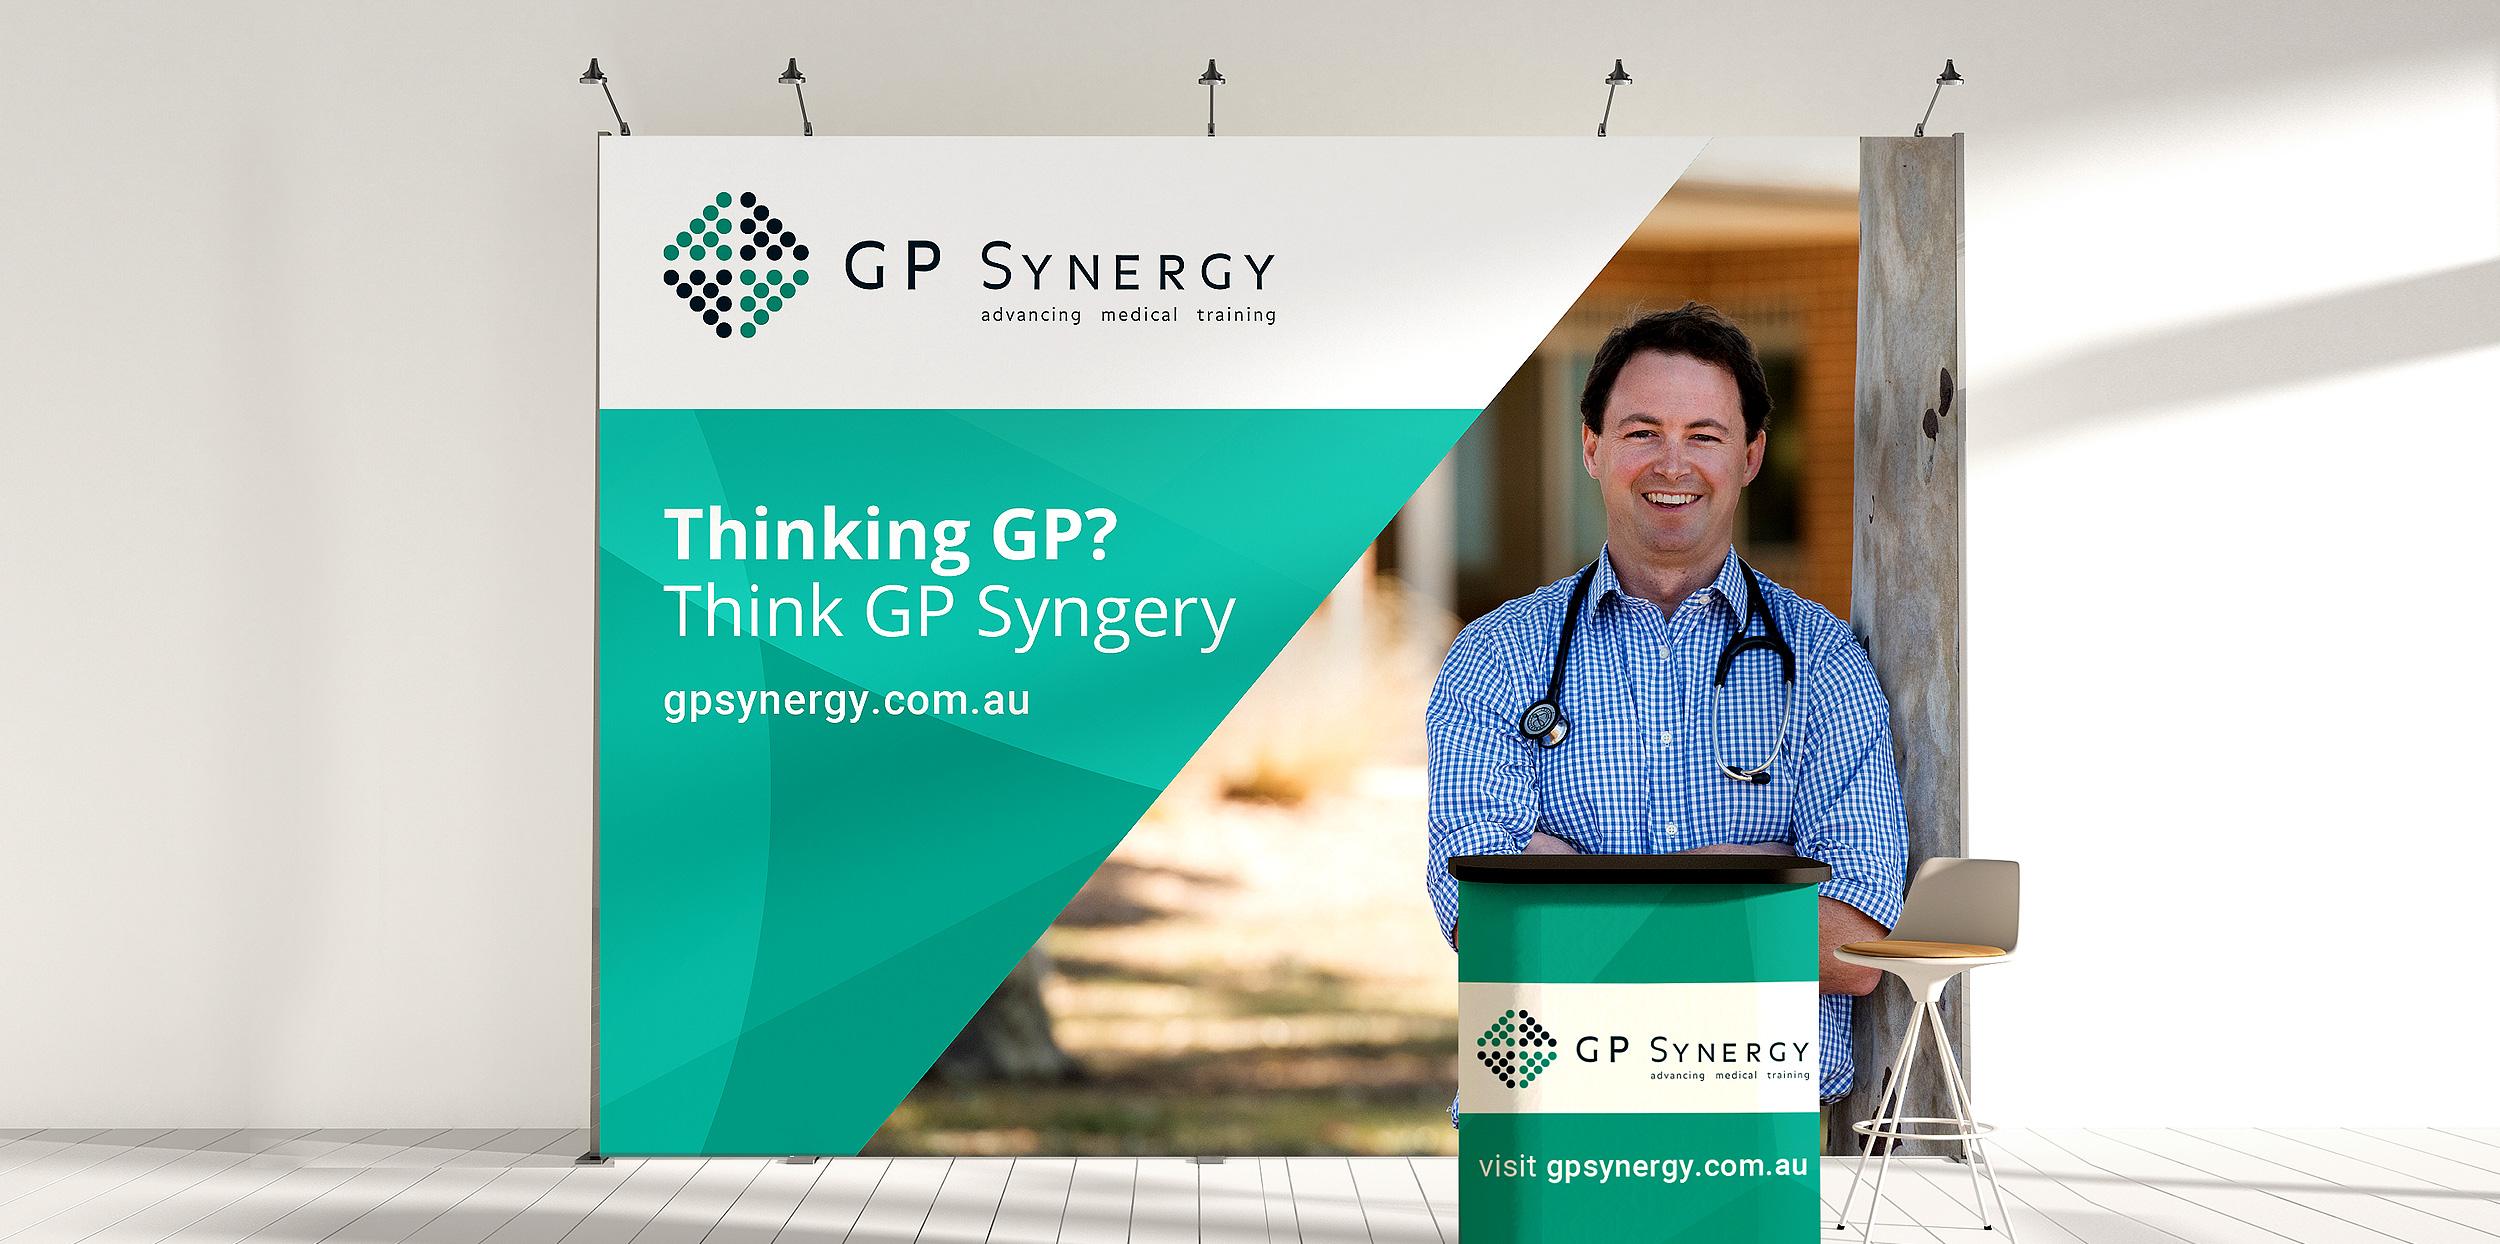 Handle-Sydney-Branding_Guidelines_Branding-GP-Synergy_06.jpg